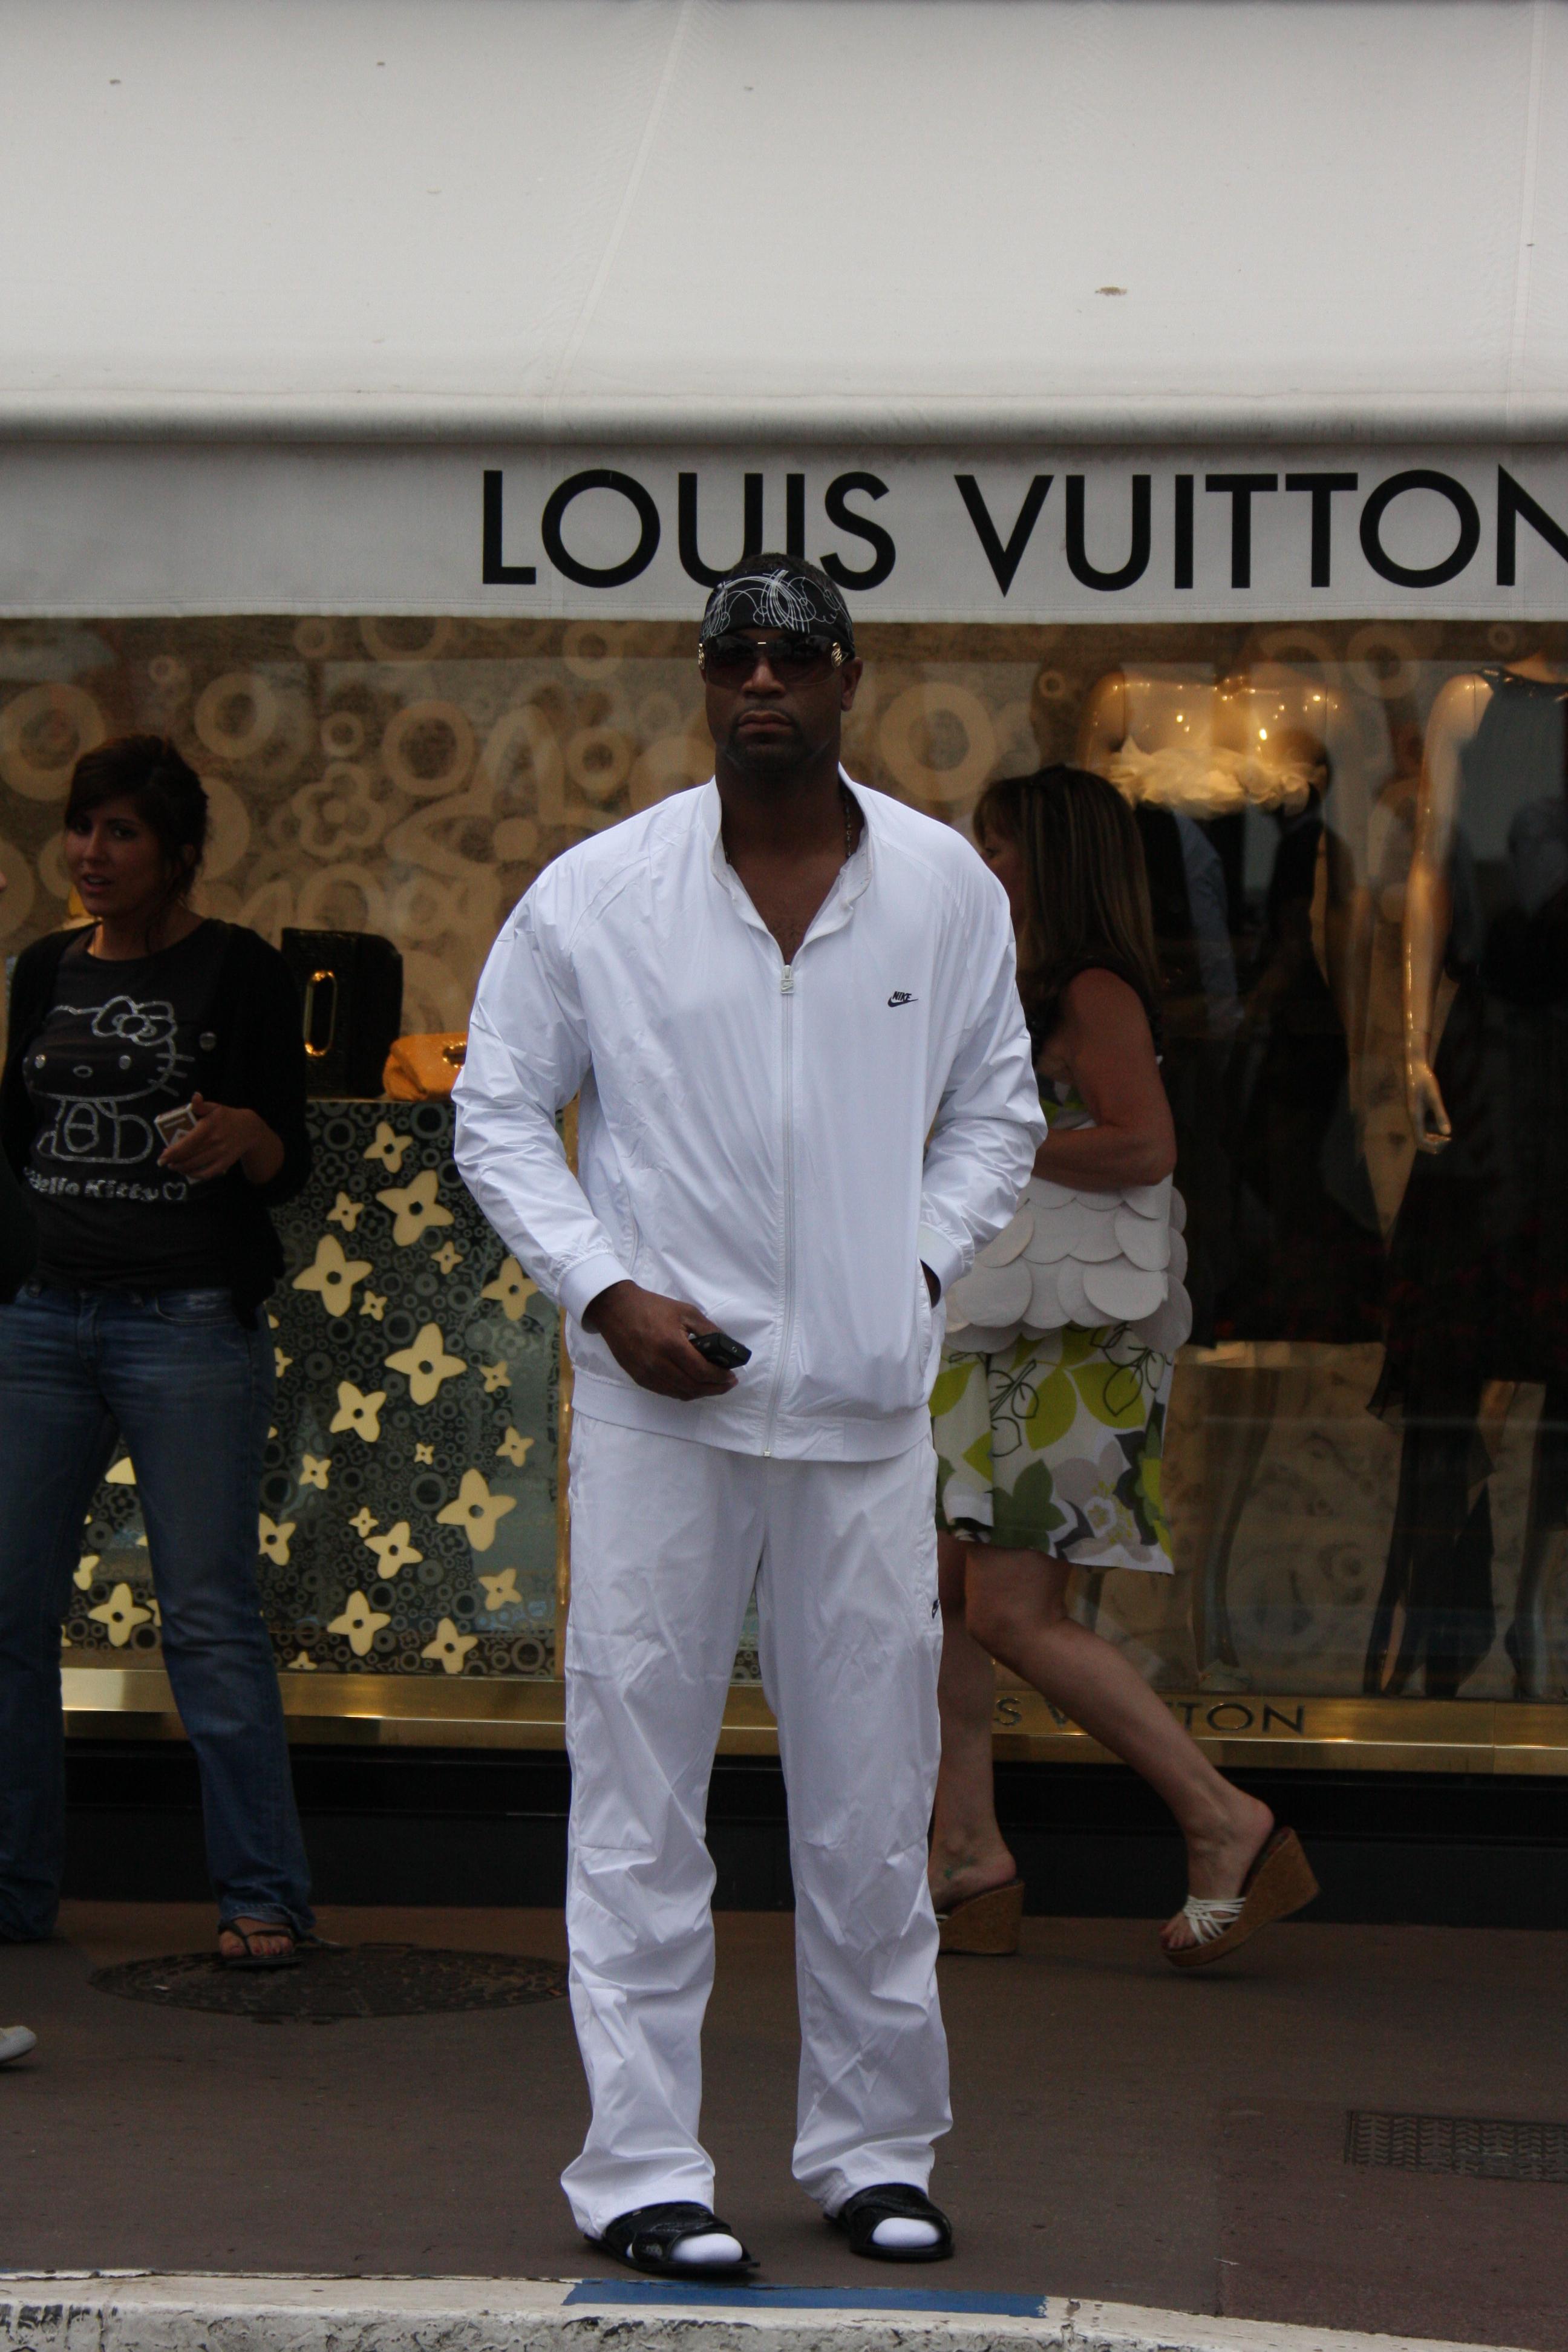 Louis (oder Vuitton?)